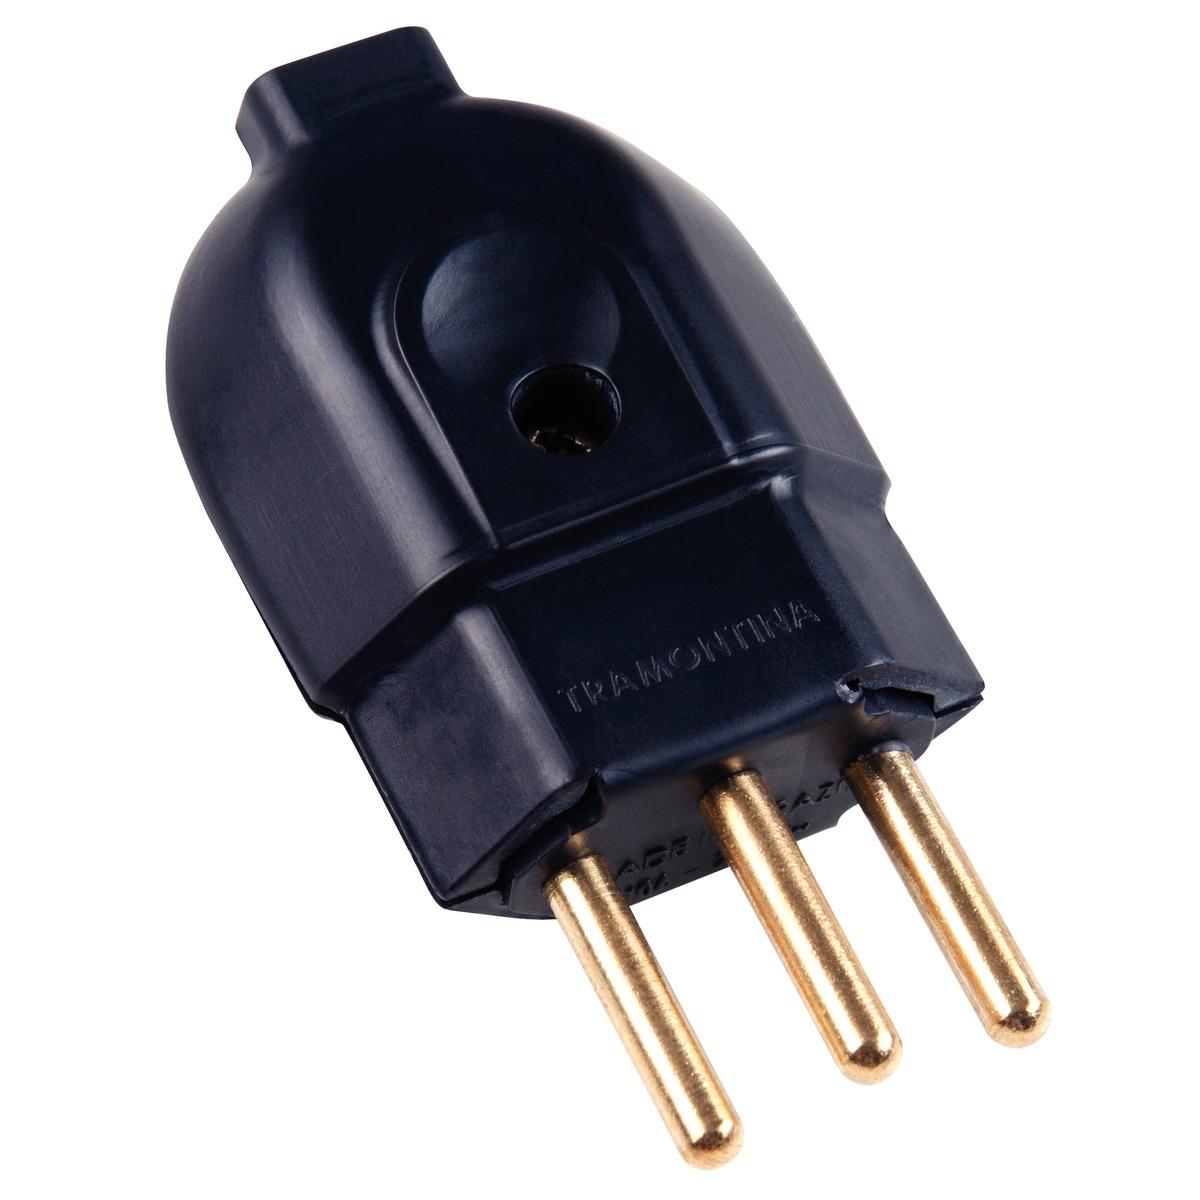 Plug Macho  PR 20A 2P+T 57403007 Tramontina